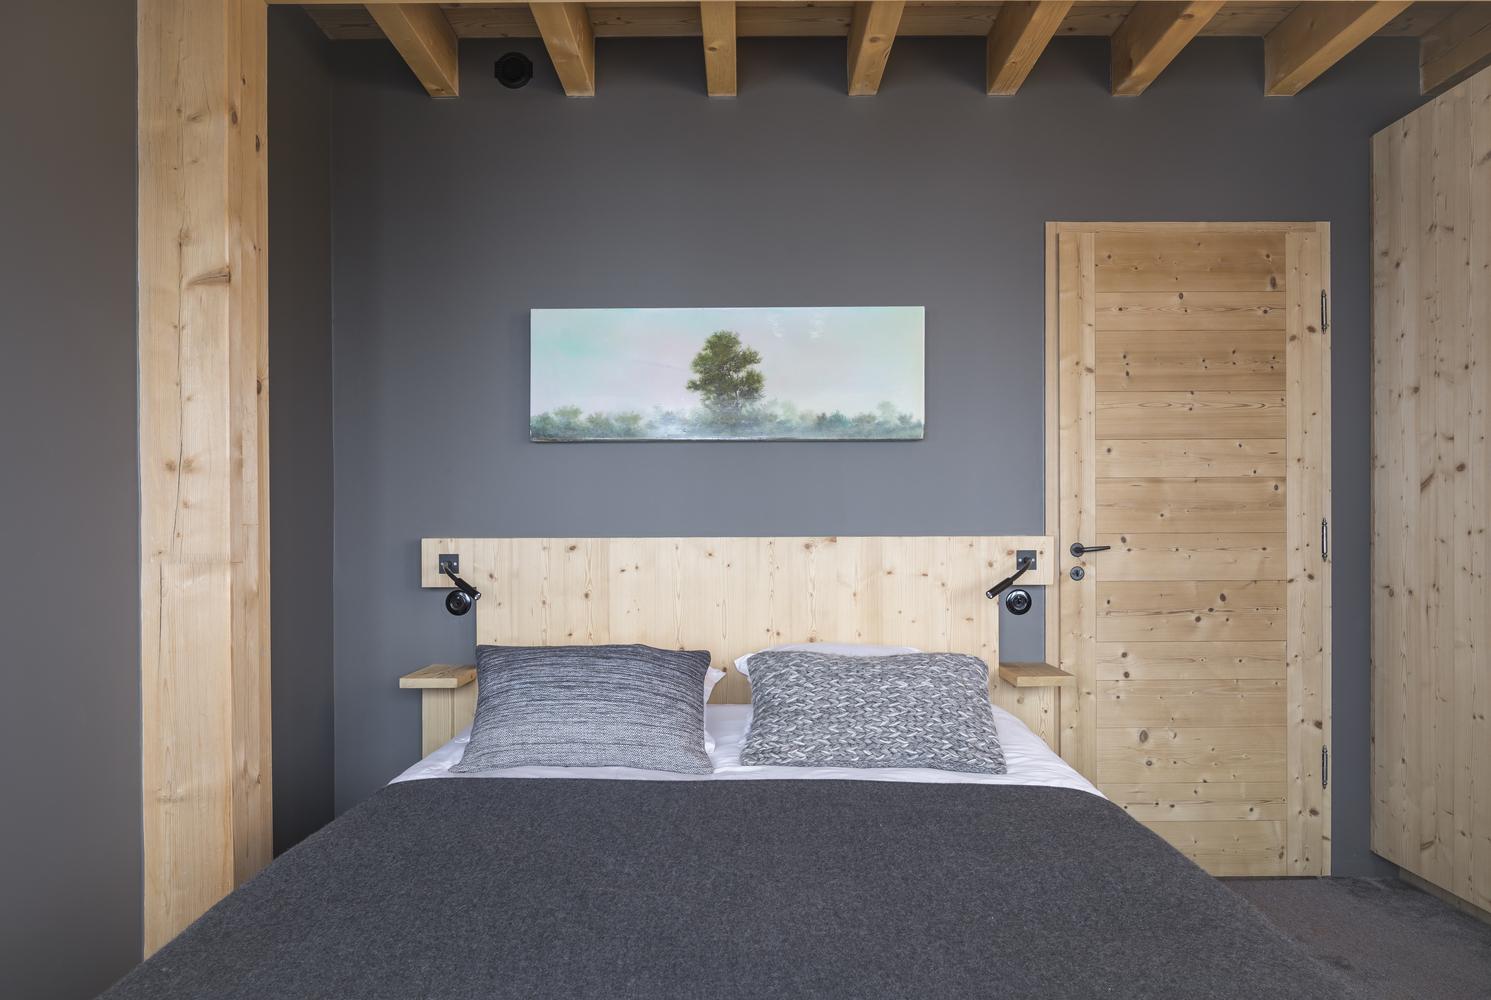 4_Mountain House_Studio Razavi architecture_Inspirationist